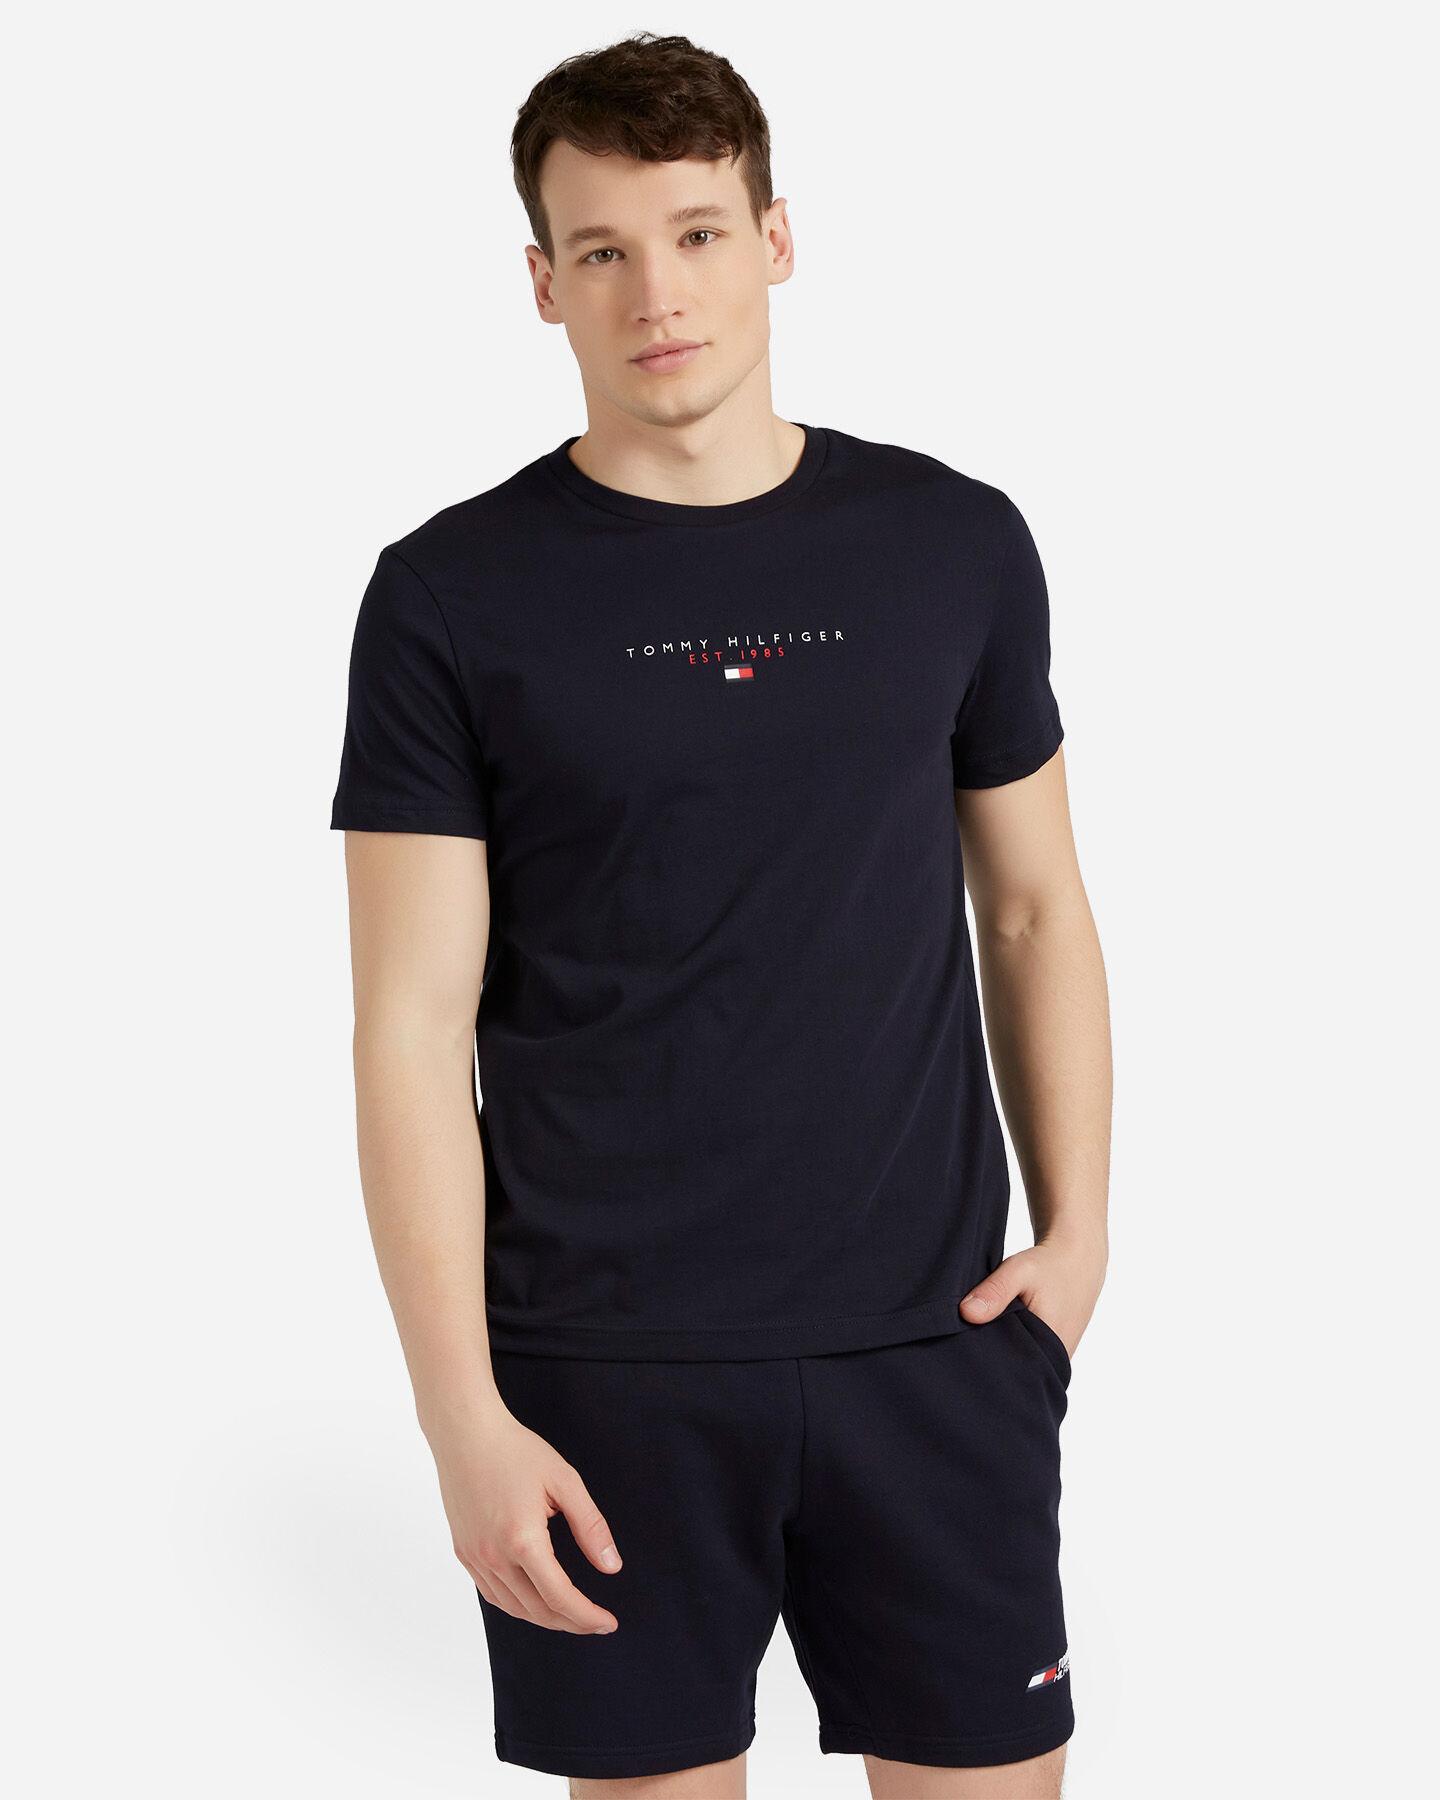 T-Shirt TOMMY HILFIGER ESSENTIAL M S4089510 scatto 0